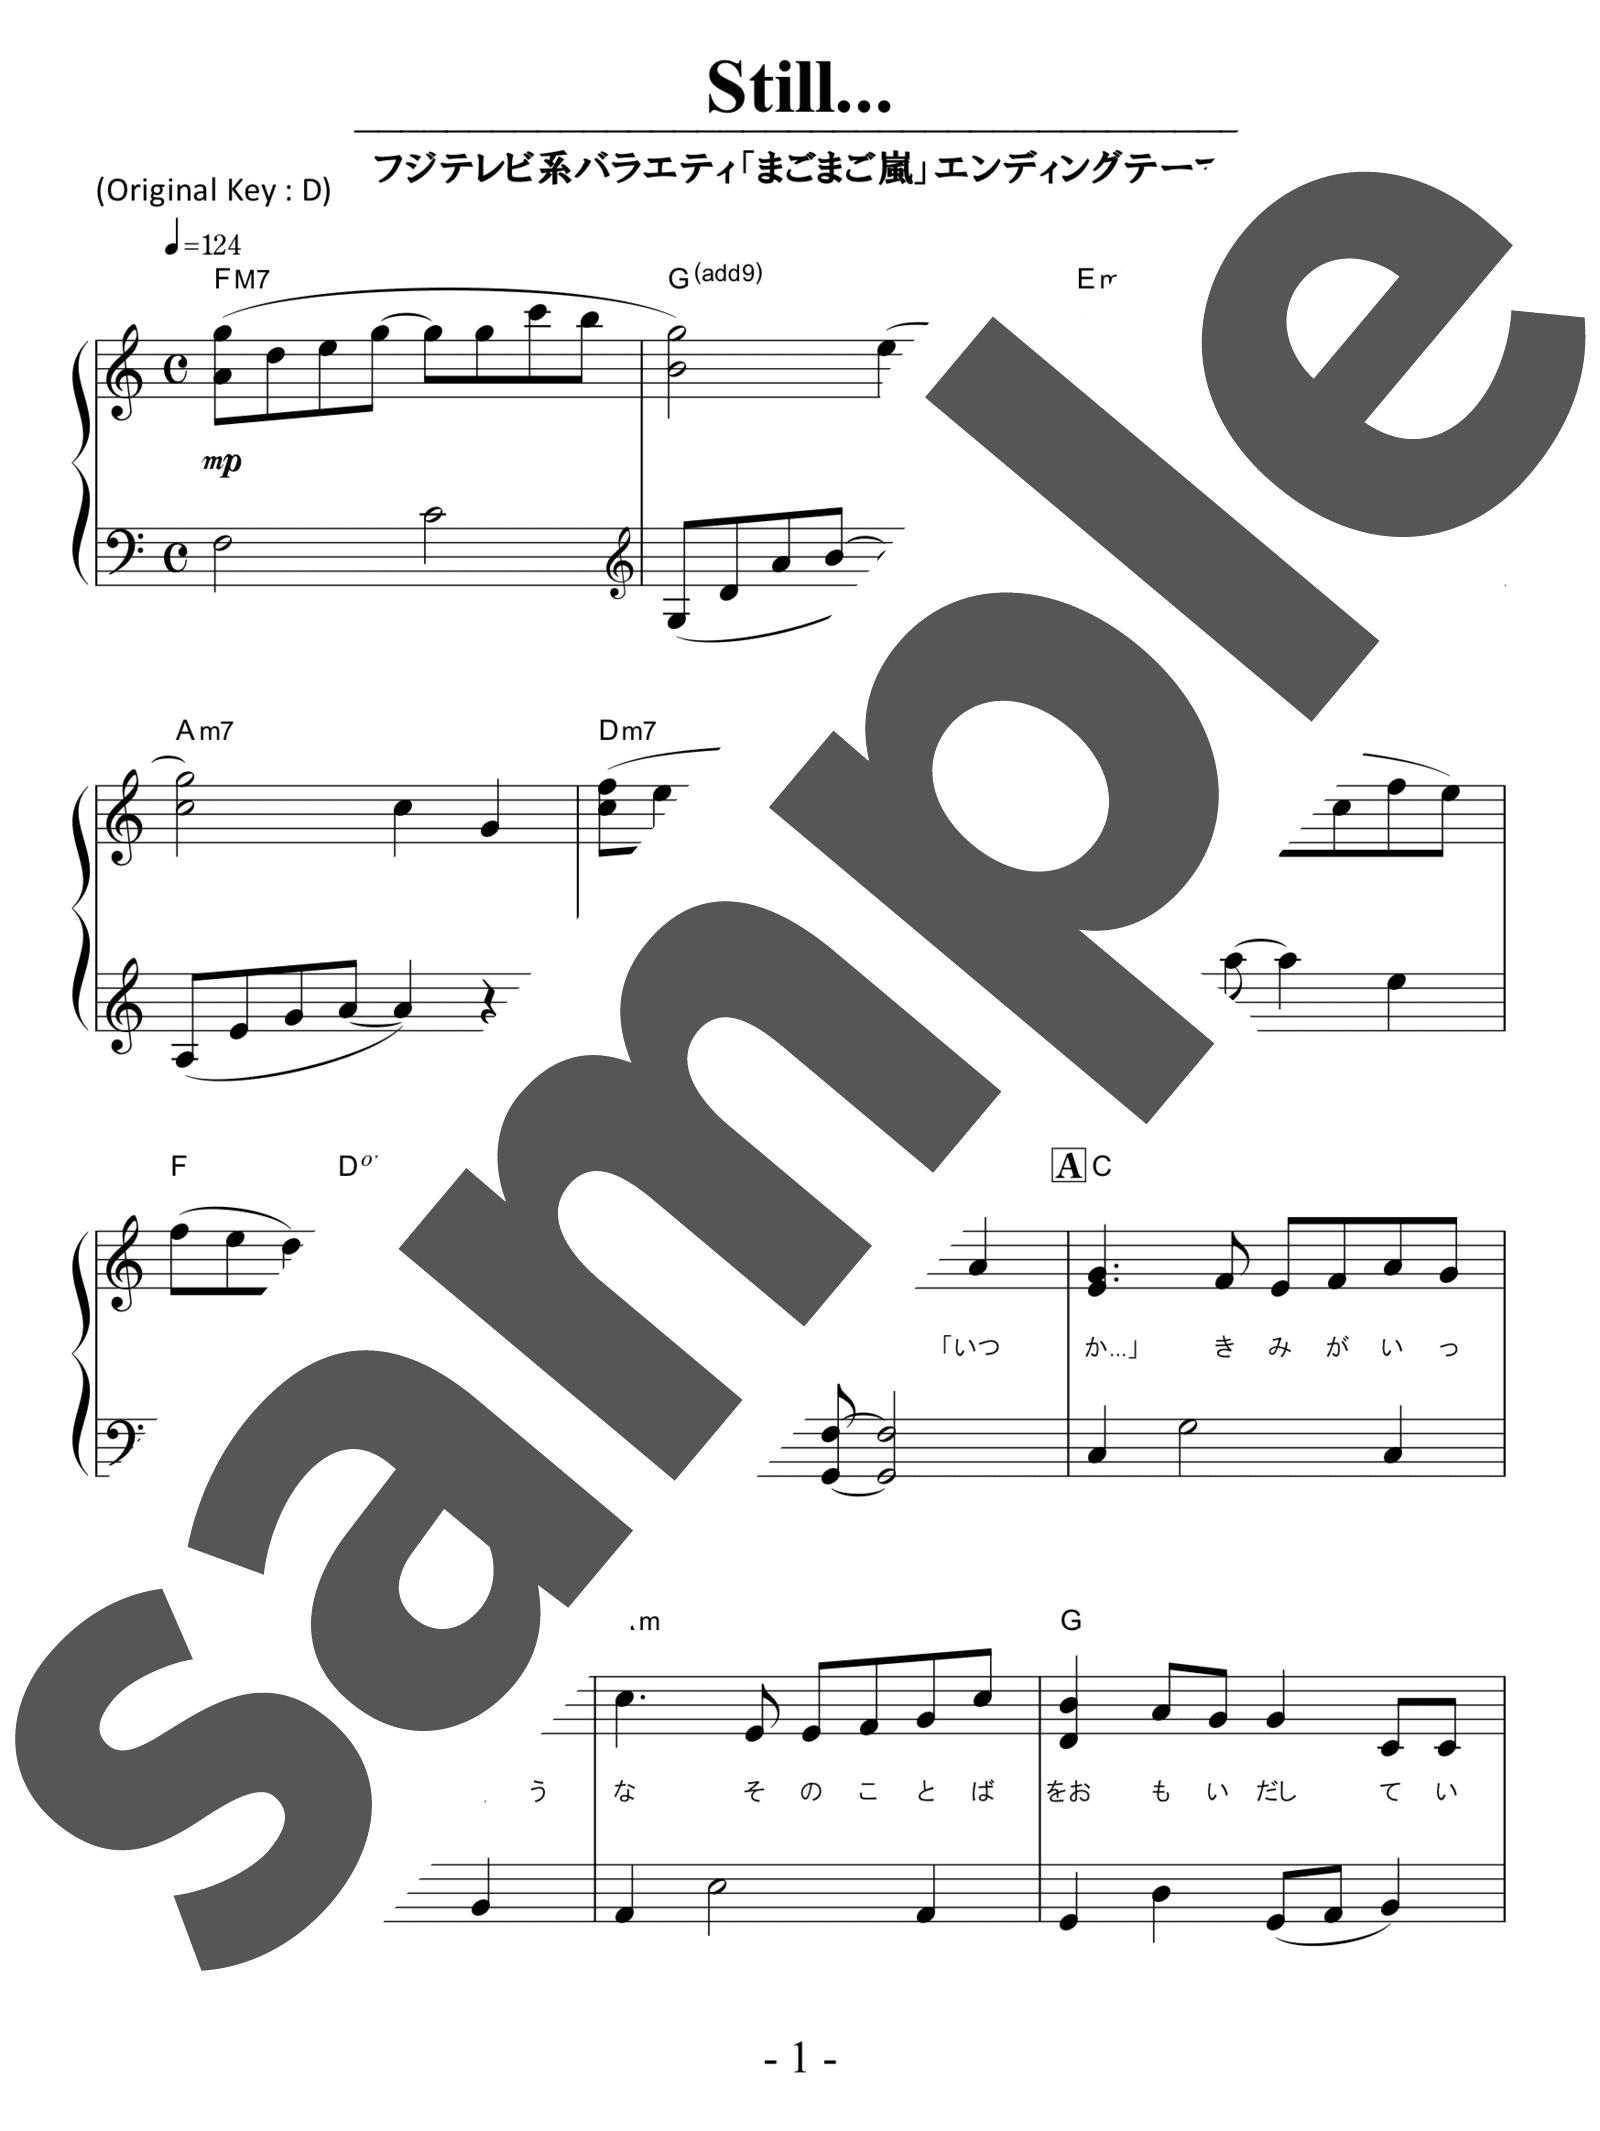 「Still...」のサンプル楽譜